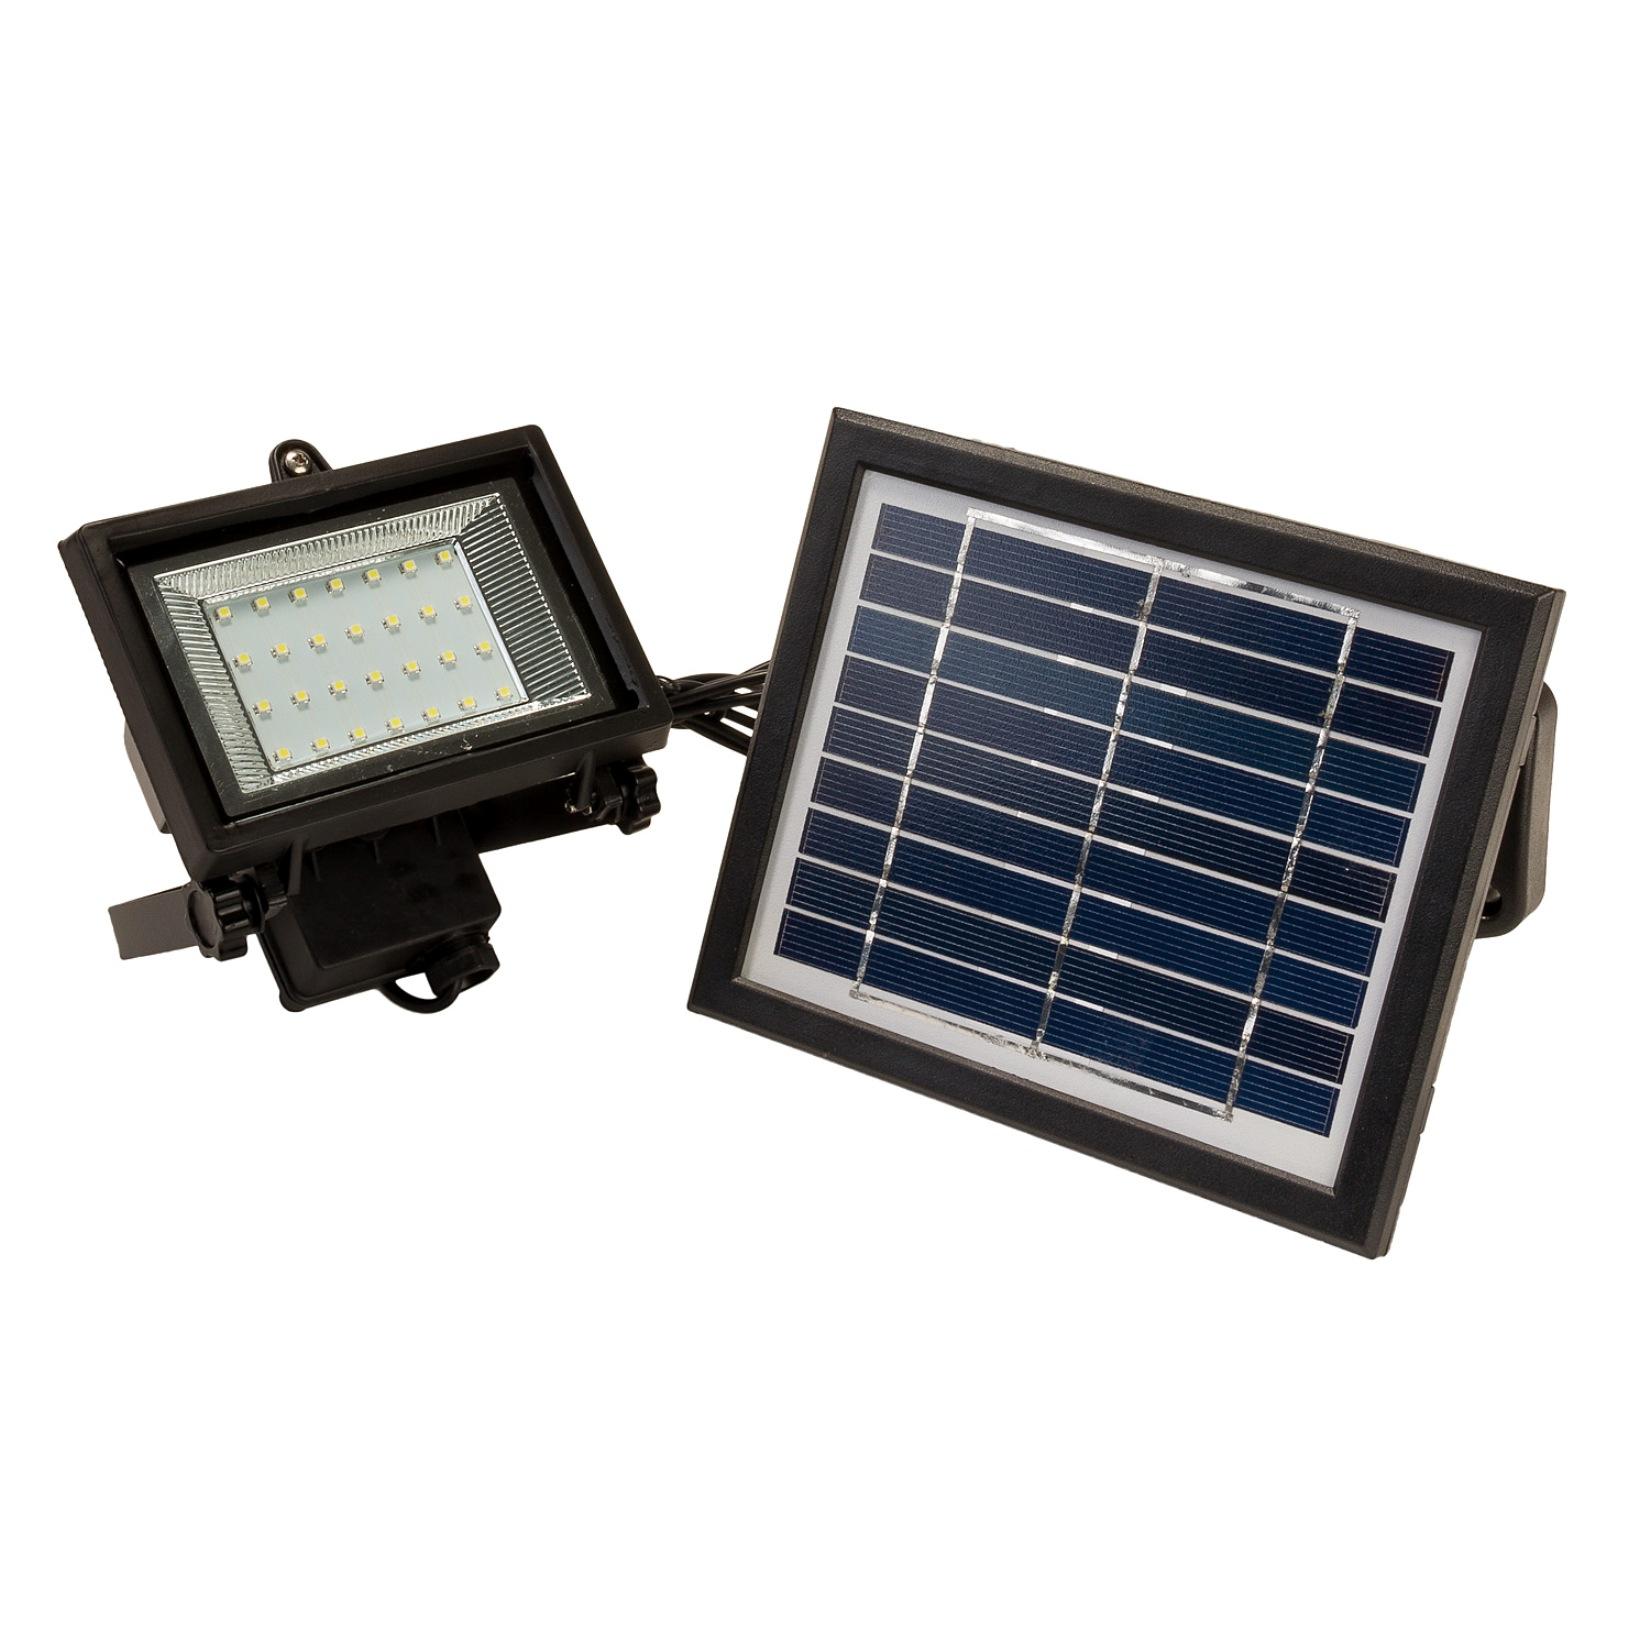 Solar Operated Flood Lights : Led solar powered flood light